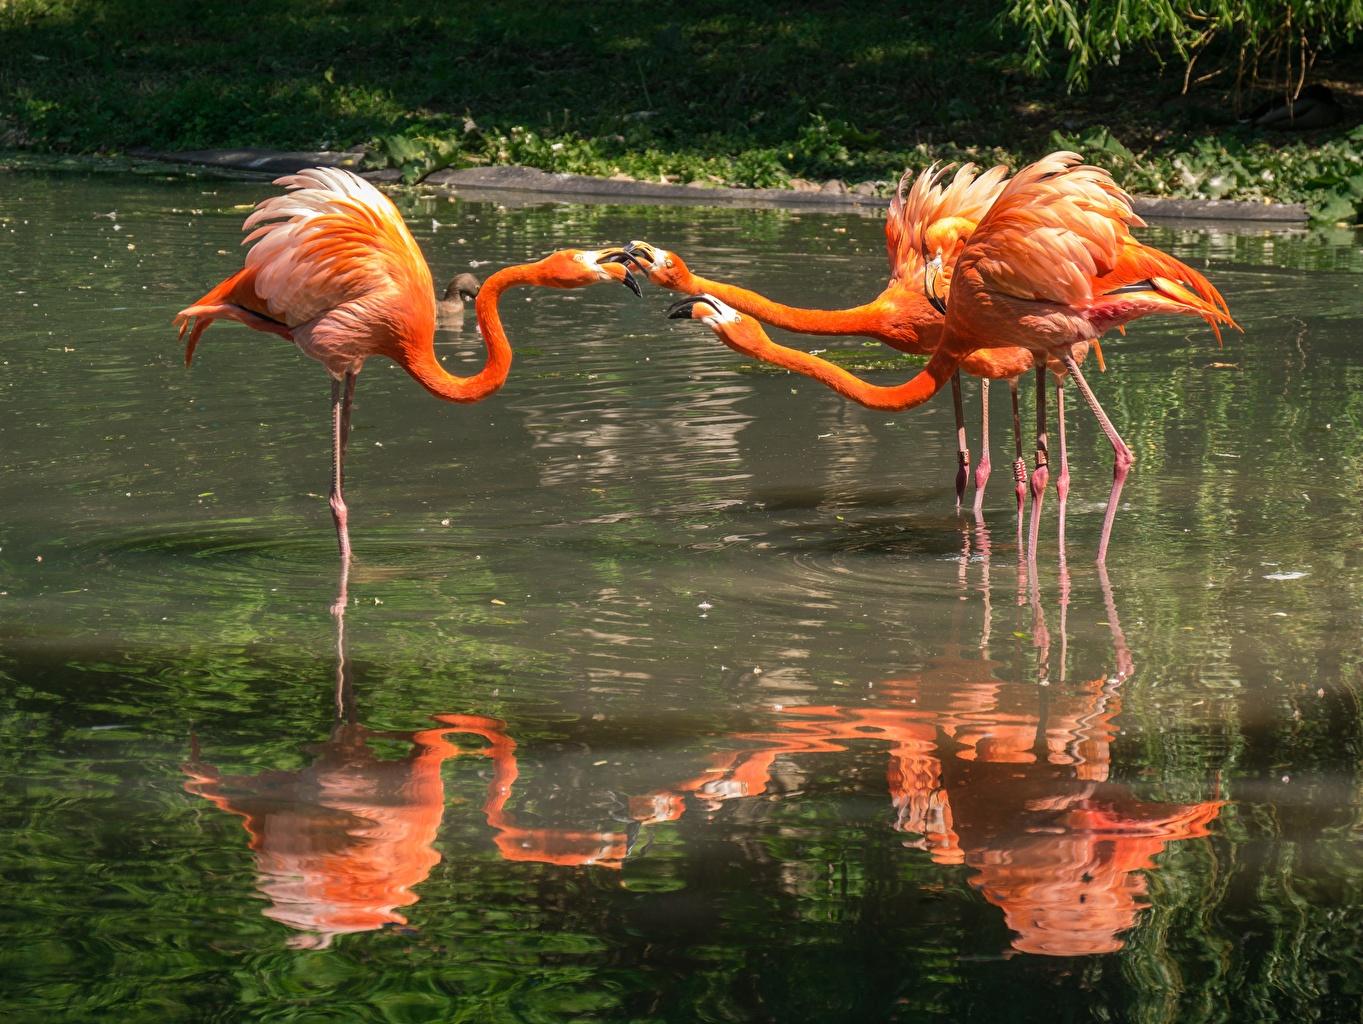 Image bird Flamingo Orange Pond Three 3 Animals Birds animal